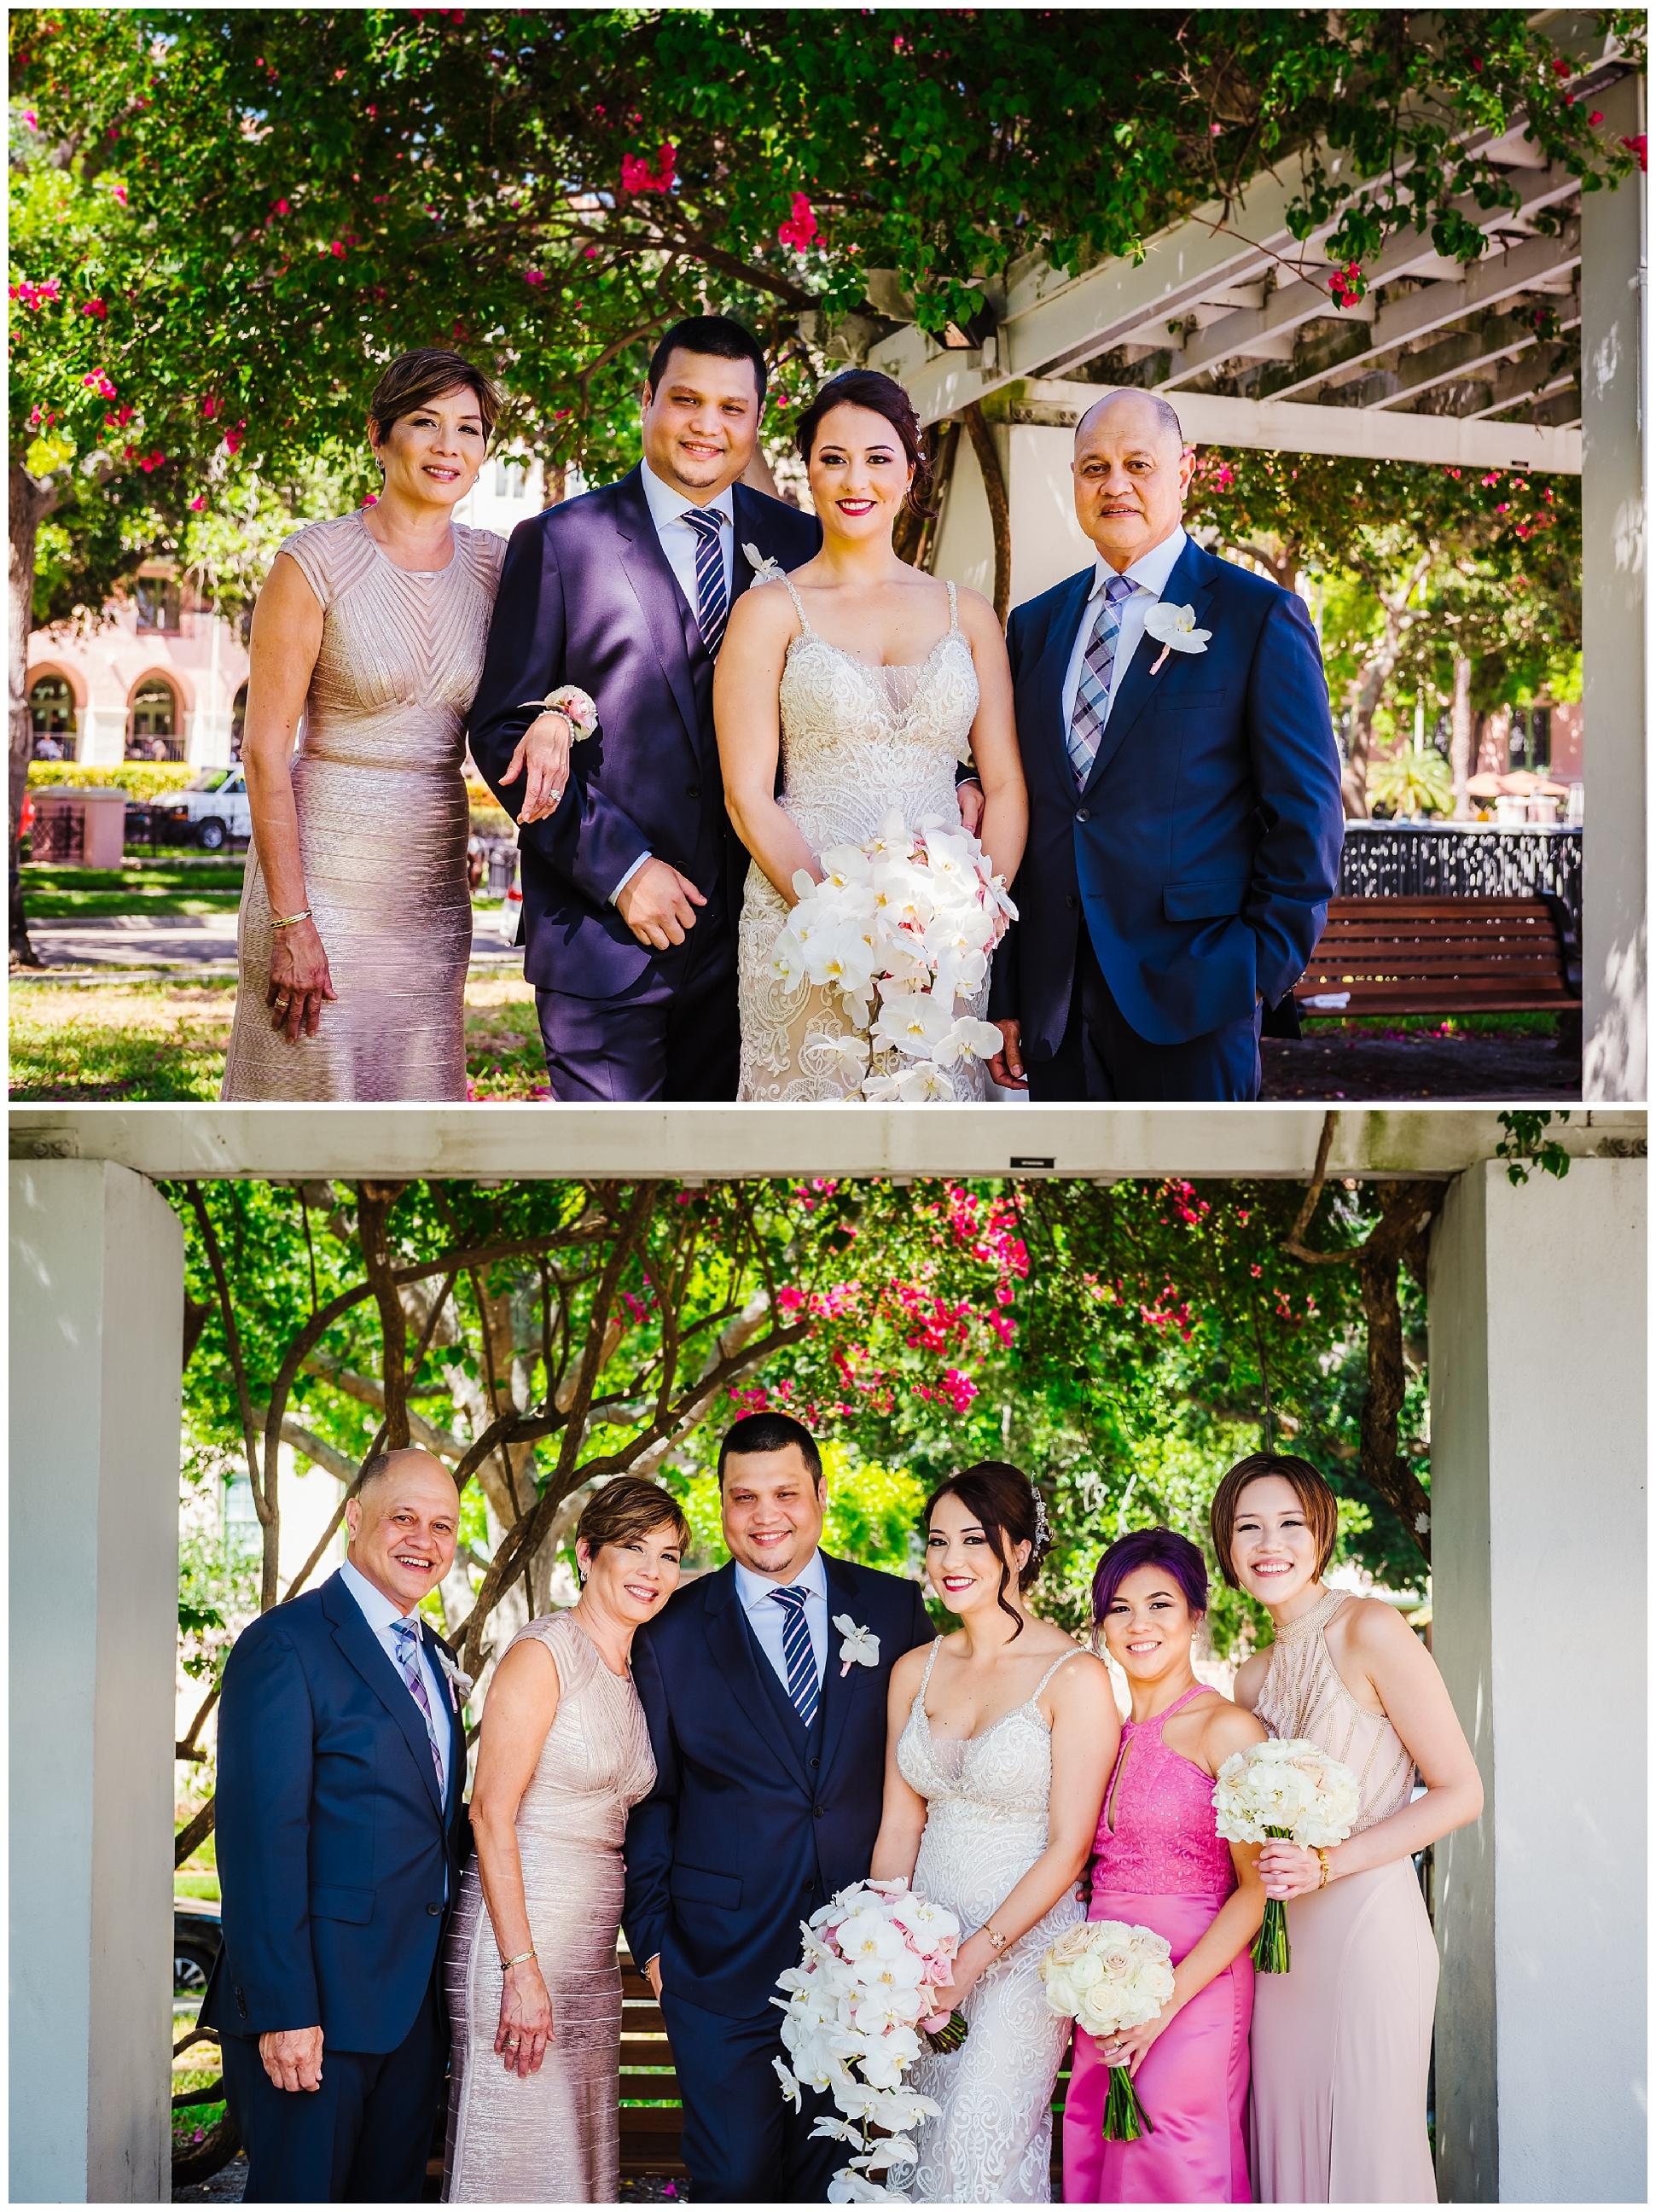 vinoy-sunset-ballroom-rainy-day-wedding-photography-orchids-trinidad-flawless-fetes-ashlee-hamon_0114.jpg